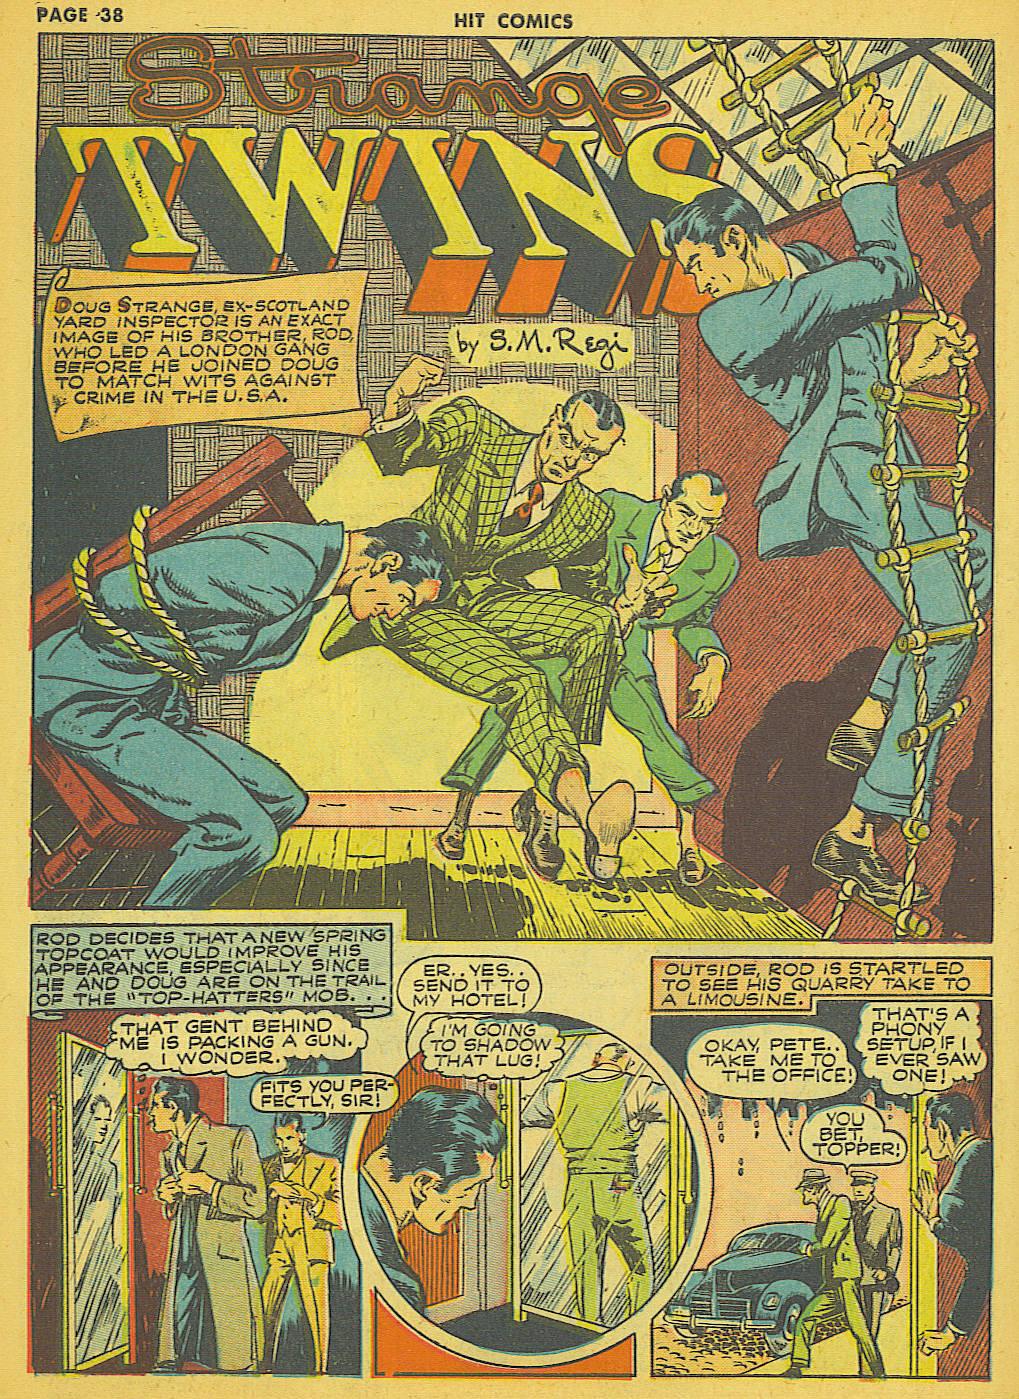 Read online Hit Comics comic -  Issue #21 - 40